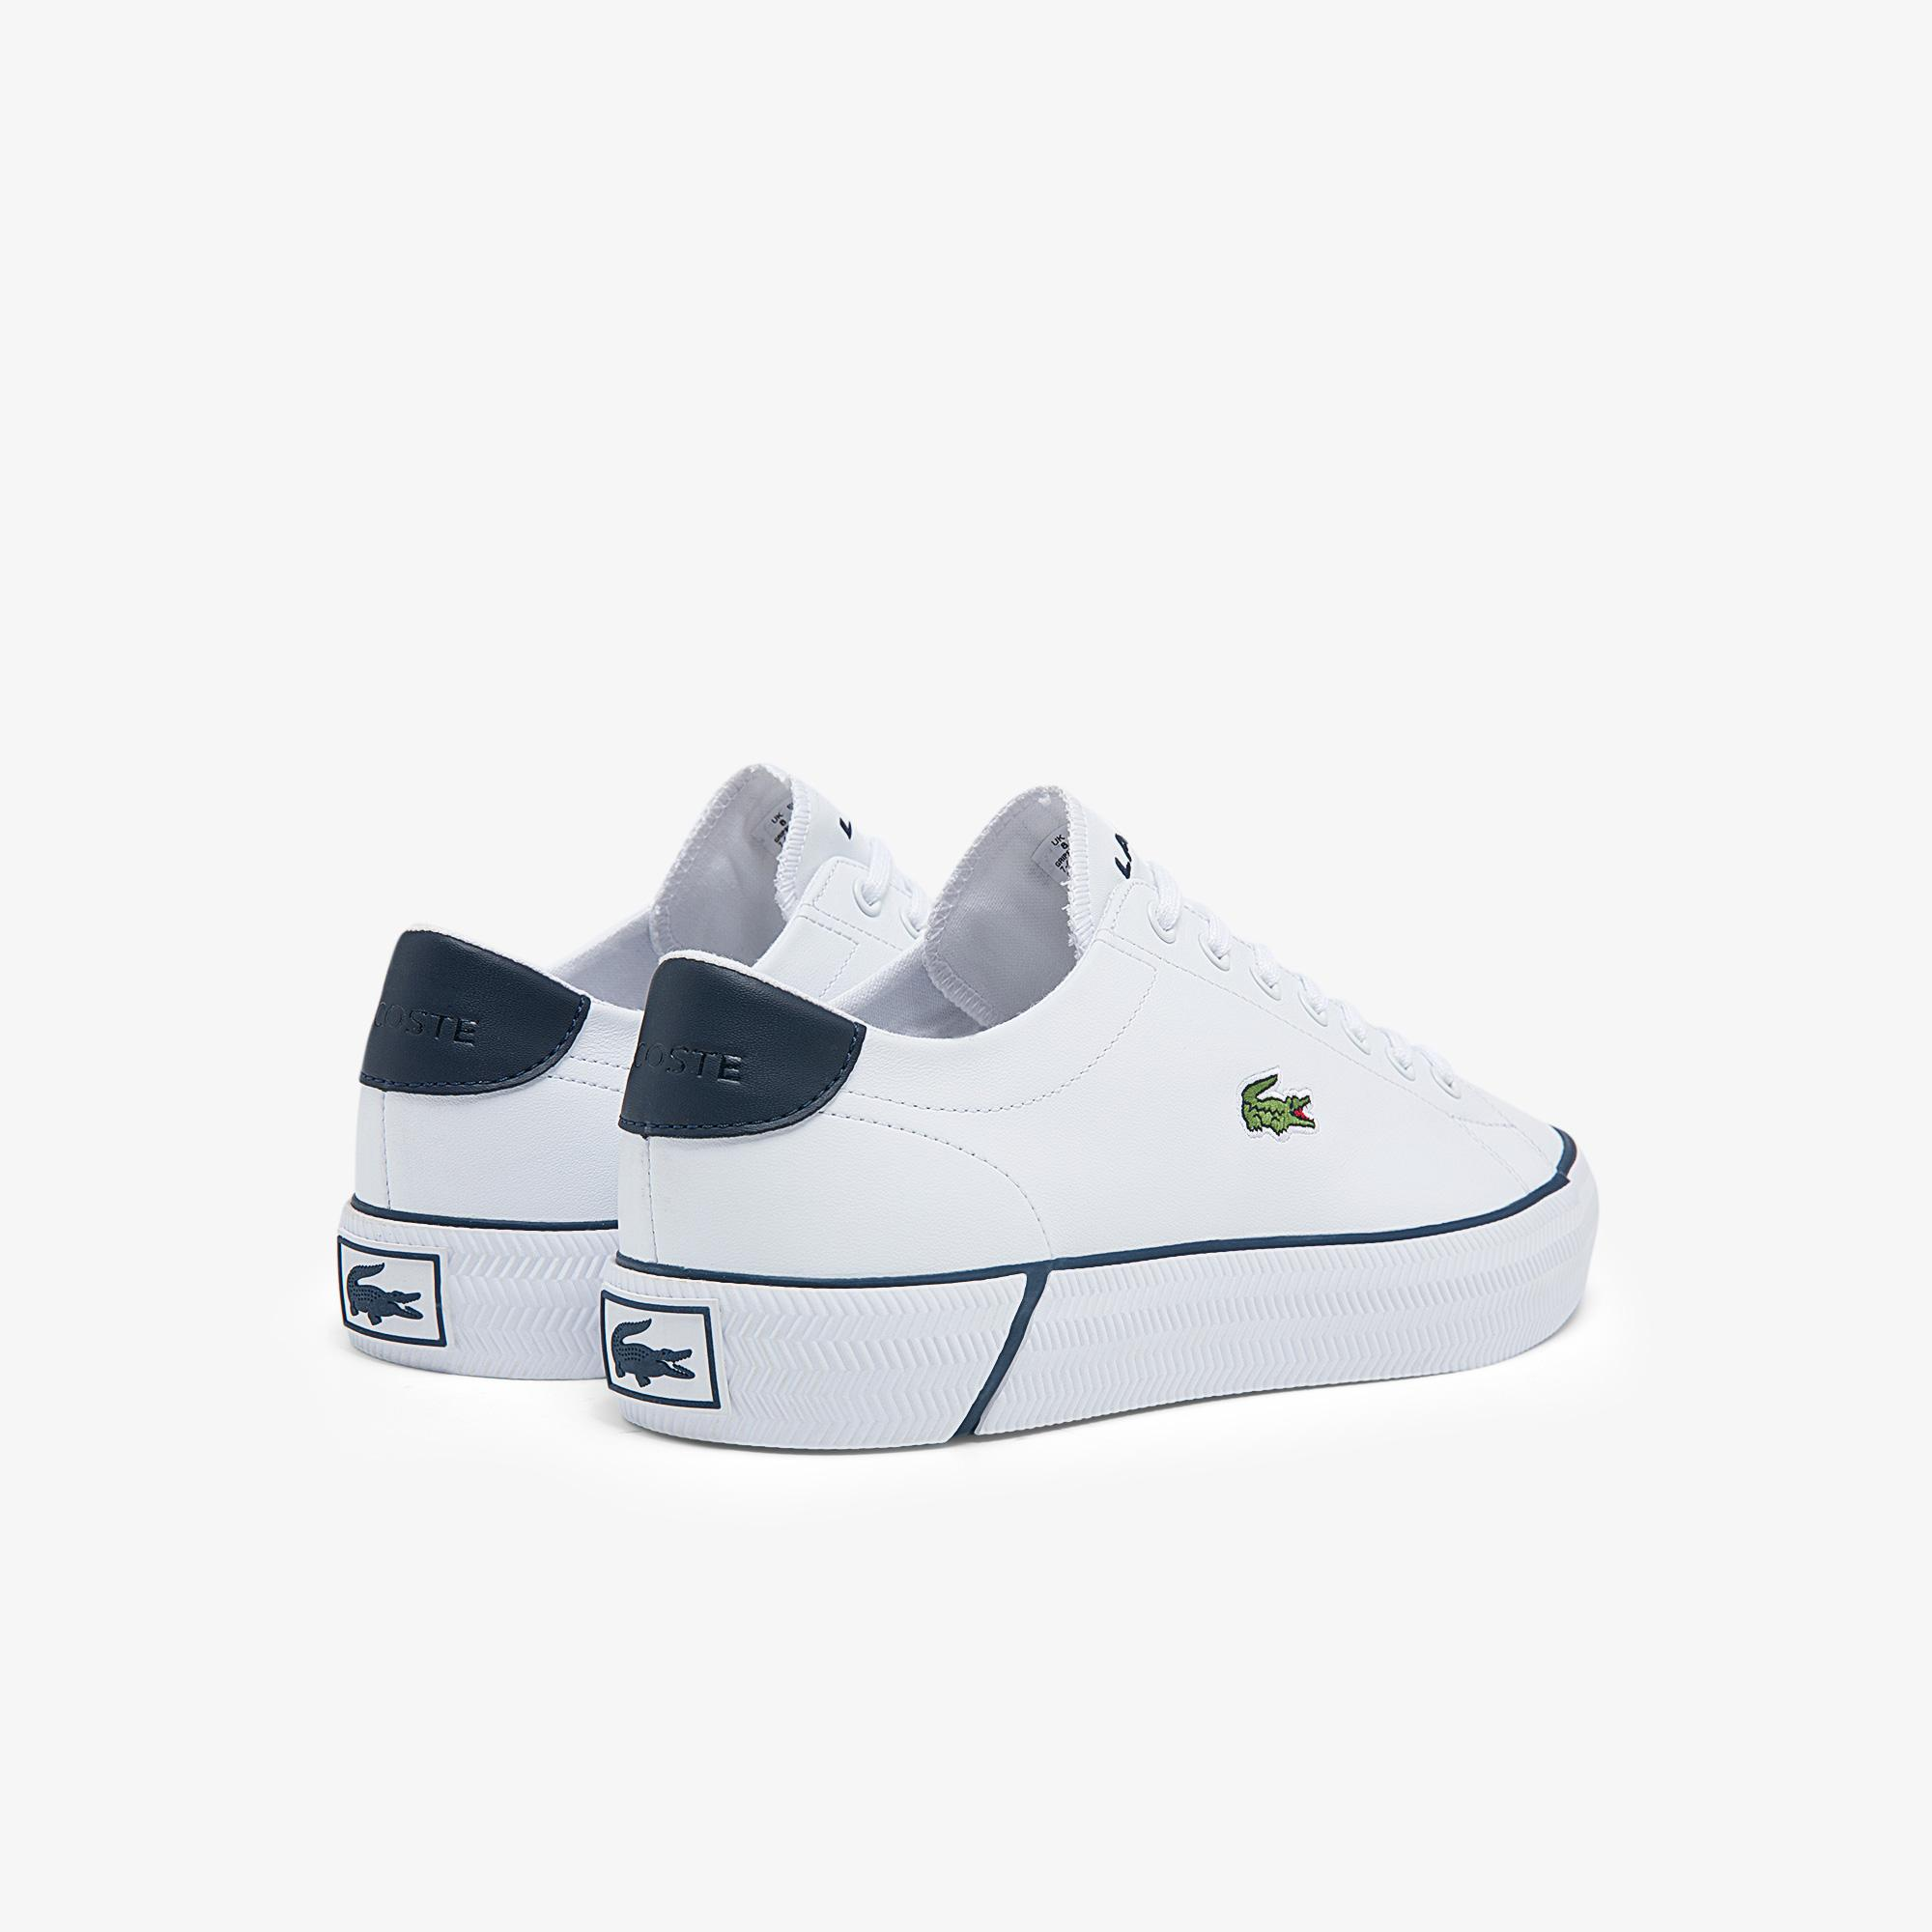 Lacoste Gripshot Bl21 1 Cma Erkek Deri Beyaz - Lacivert Sneaker